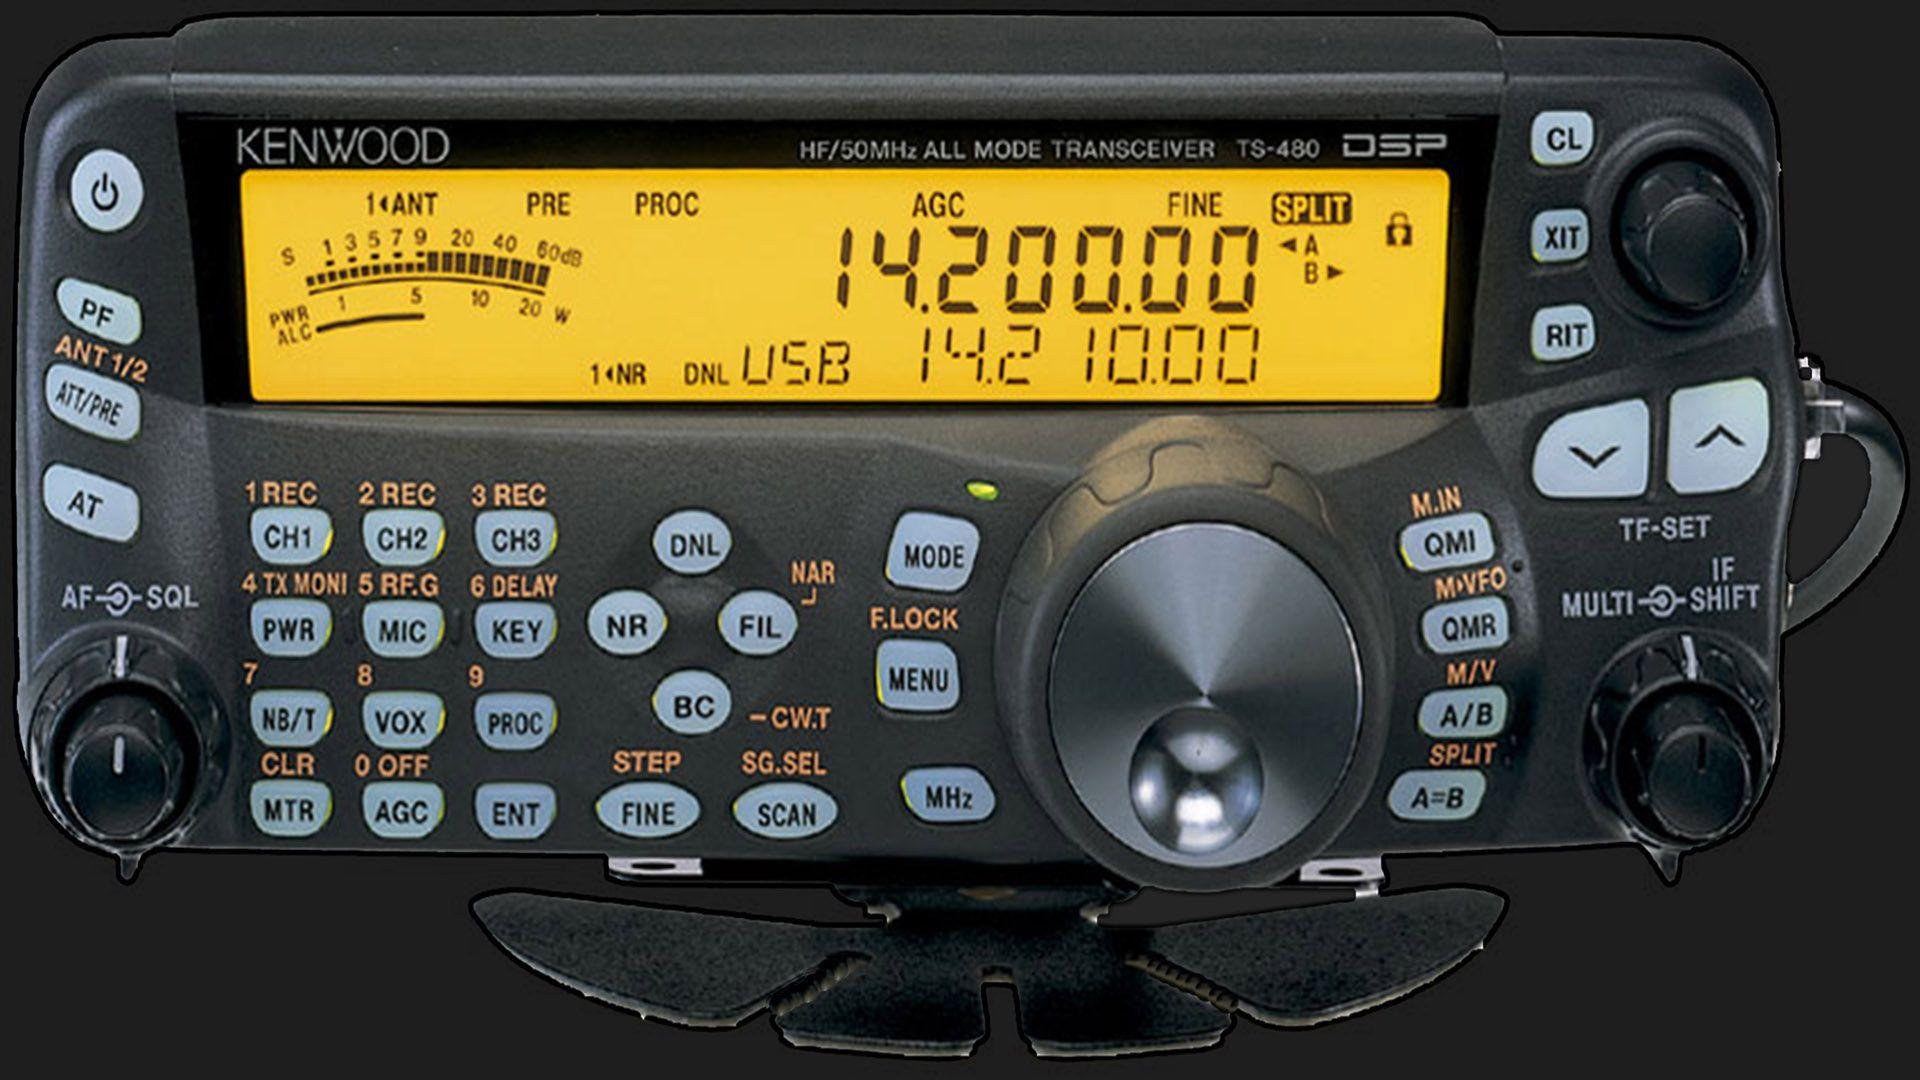 Honda Cbf 600 Service Manual - dadsfundraiserscom